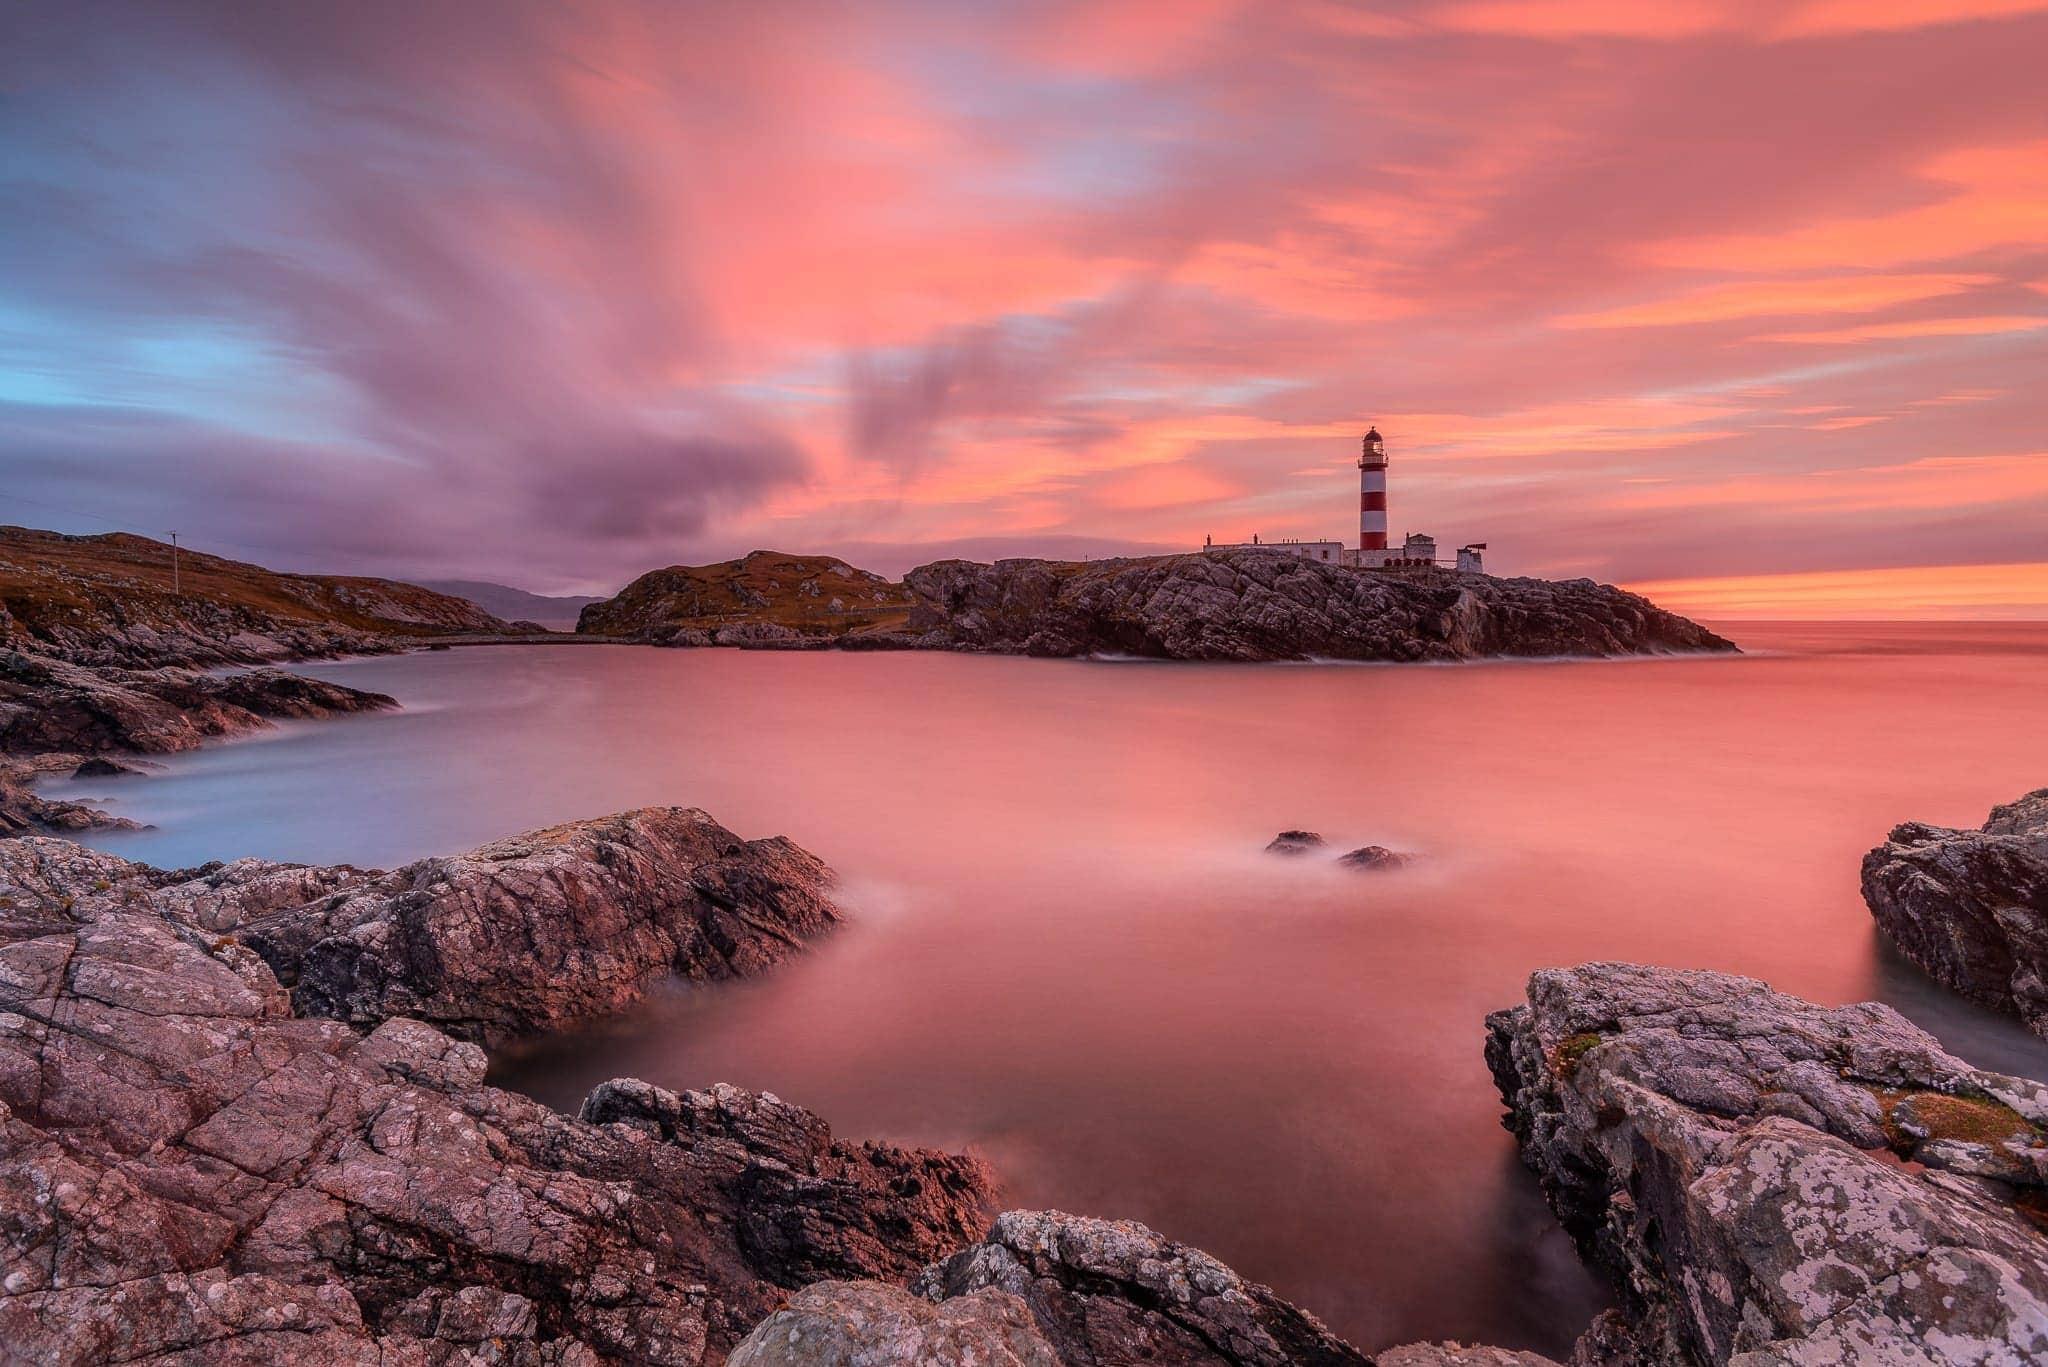 Francesco Gola Seascape Landscape Photography Outer Hebrides Lighthouse Long Exposure